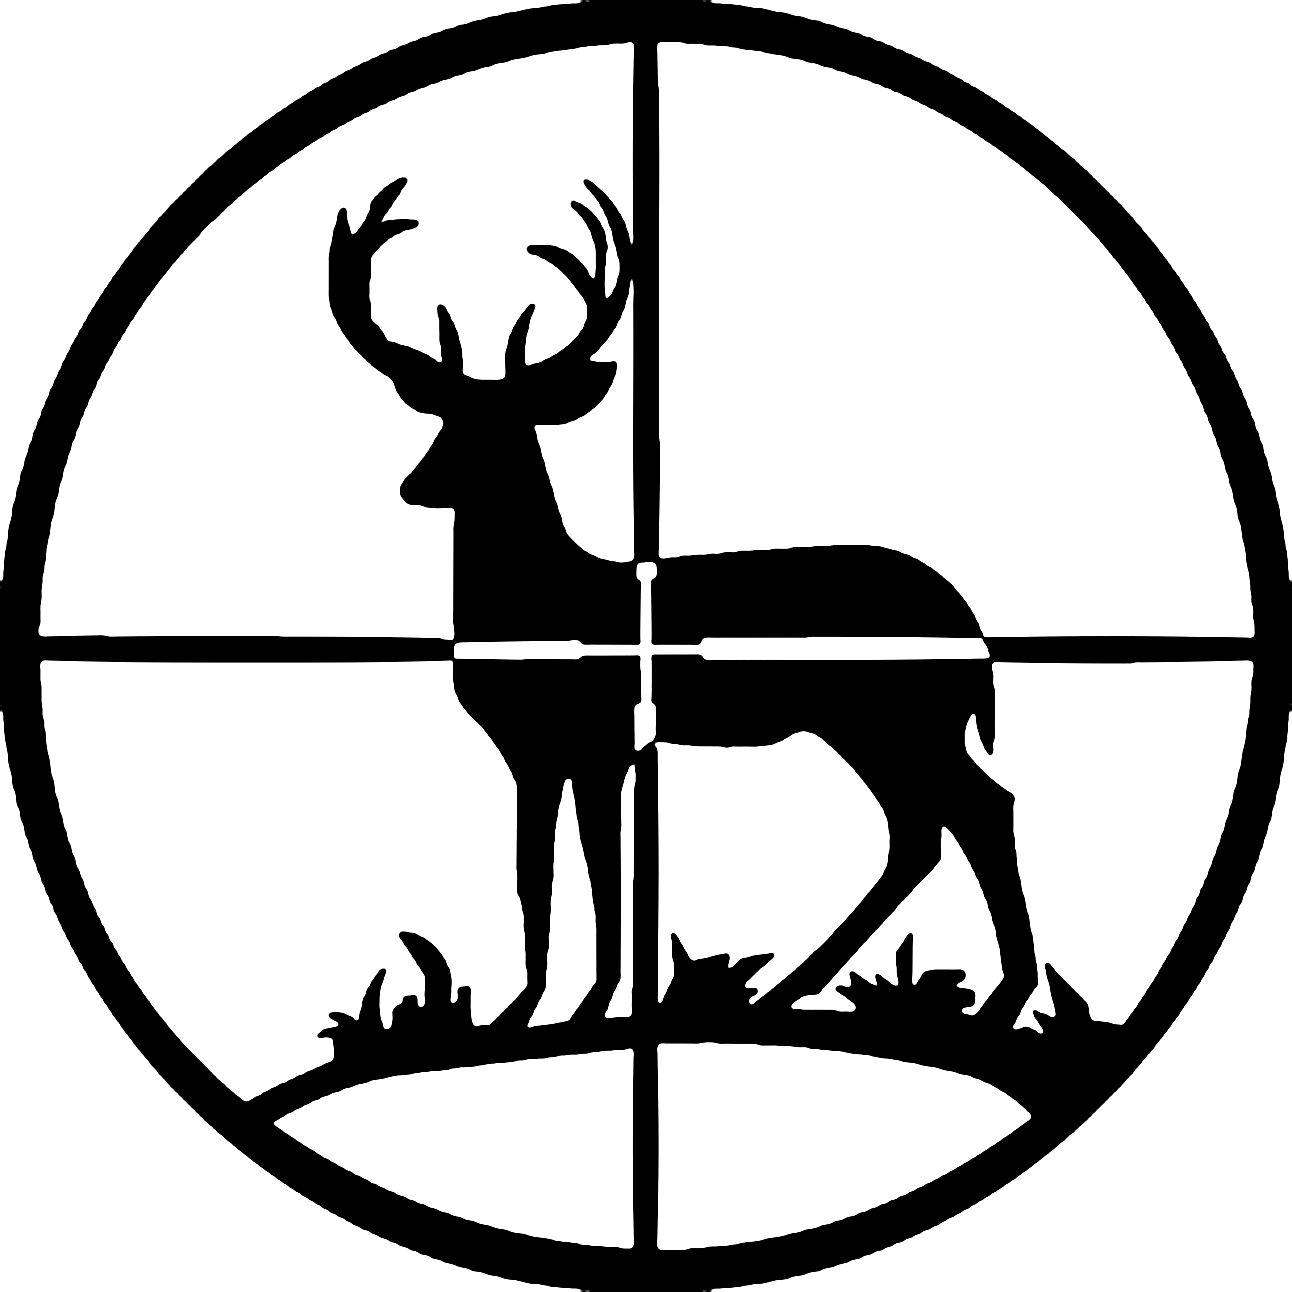 deer hunting silhouette clipart free clip art images wood rh pinterest com deer hunting clipart in color deer hunting clipart images